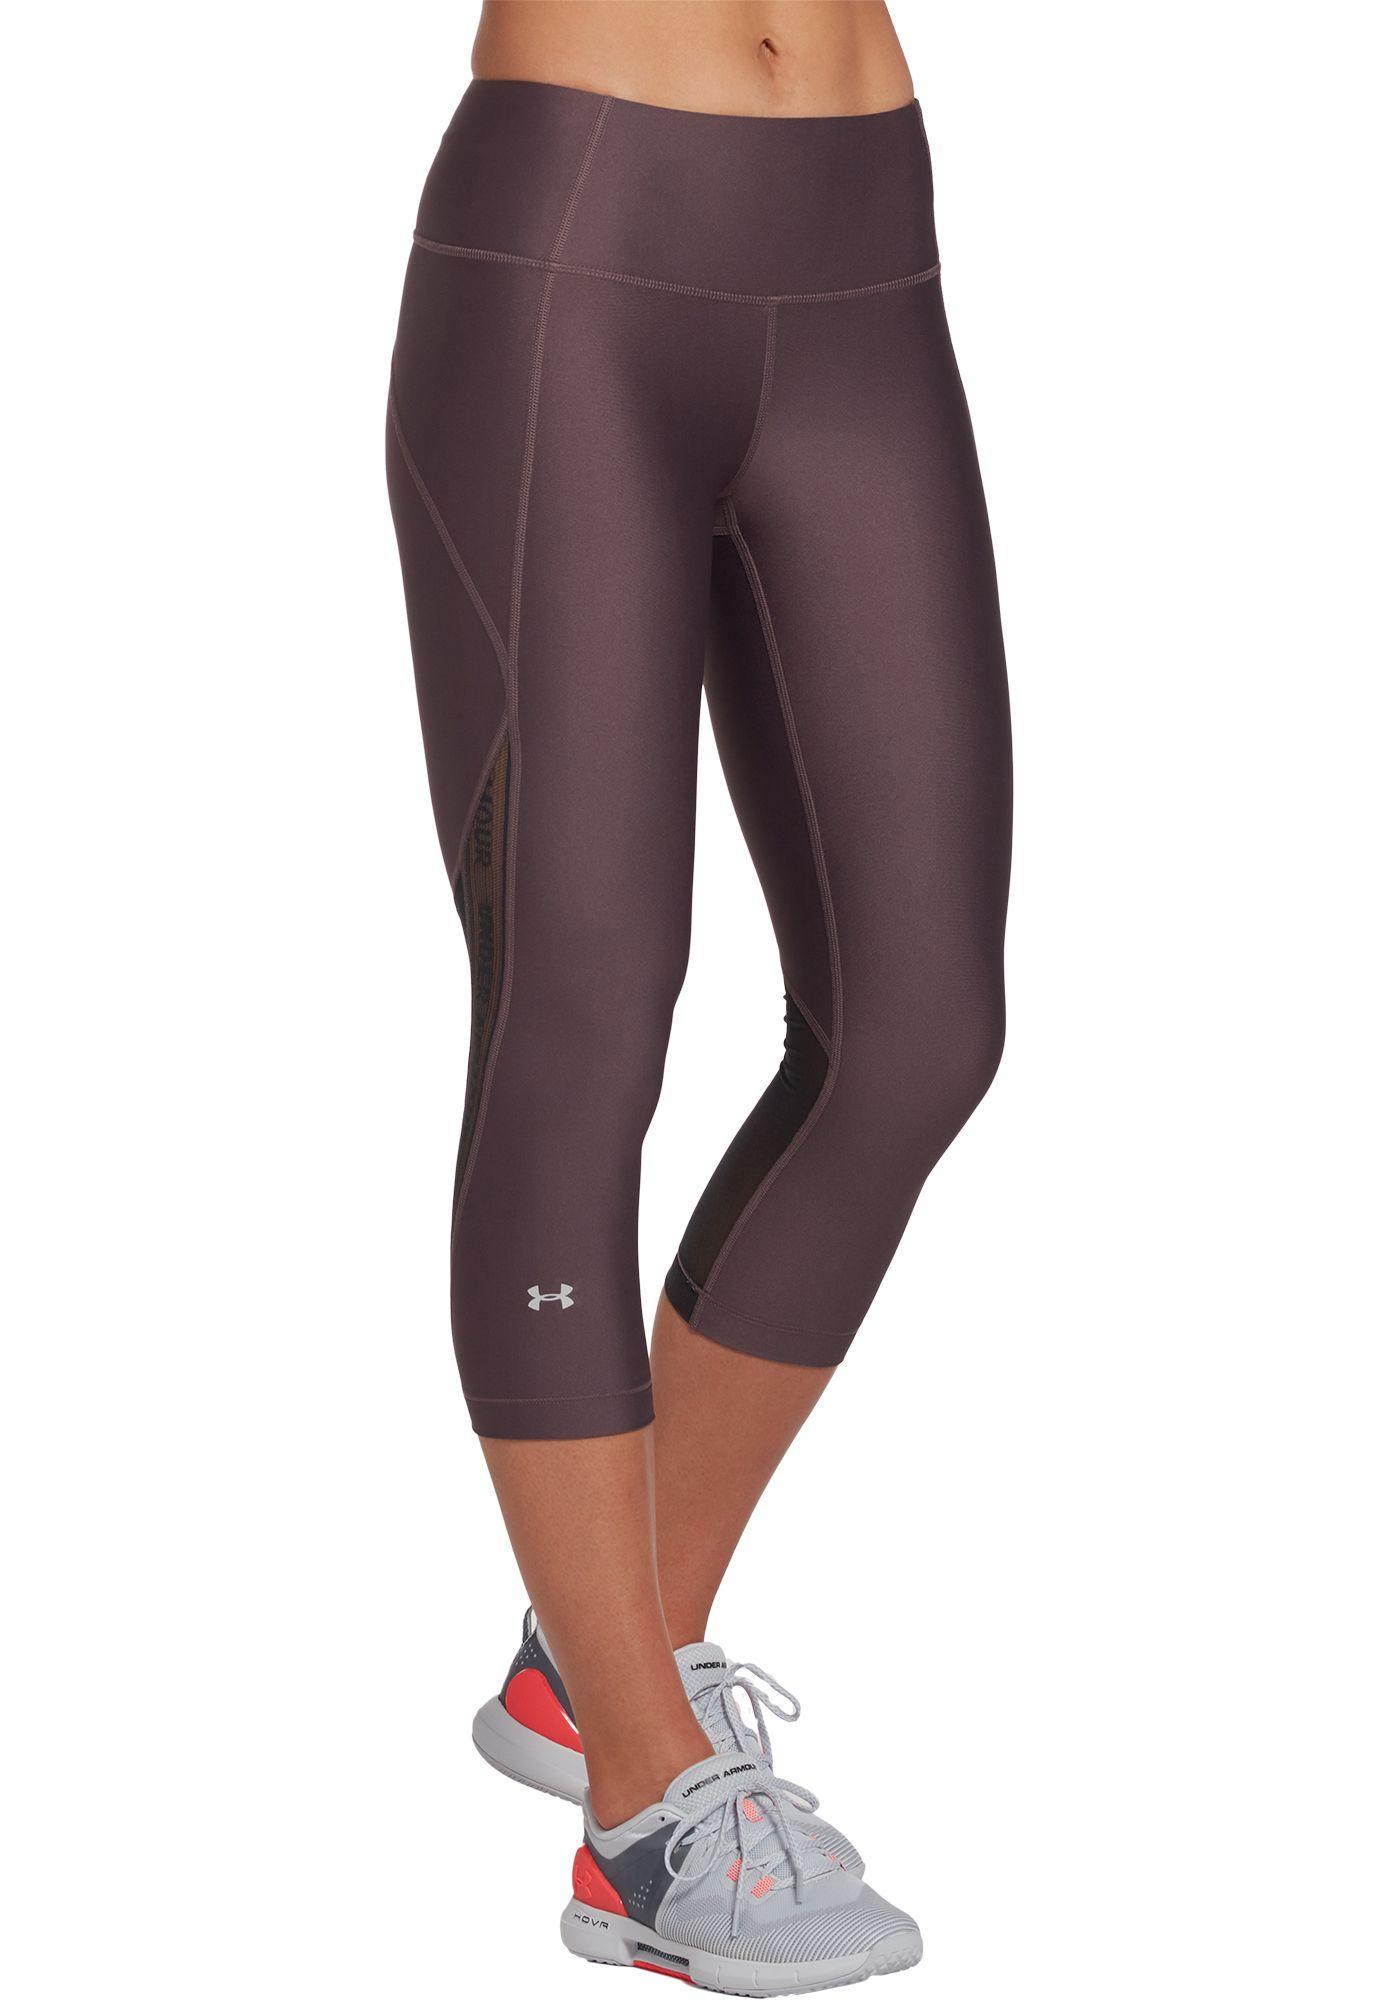 Under Armour Women's HeatGear Armour Branded Capri Leggings